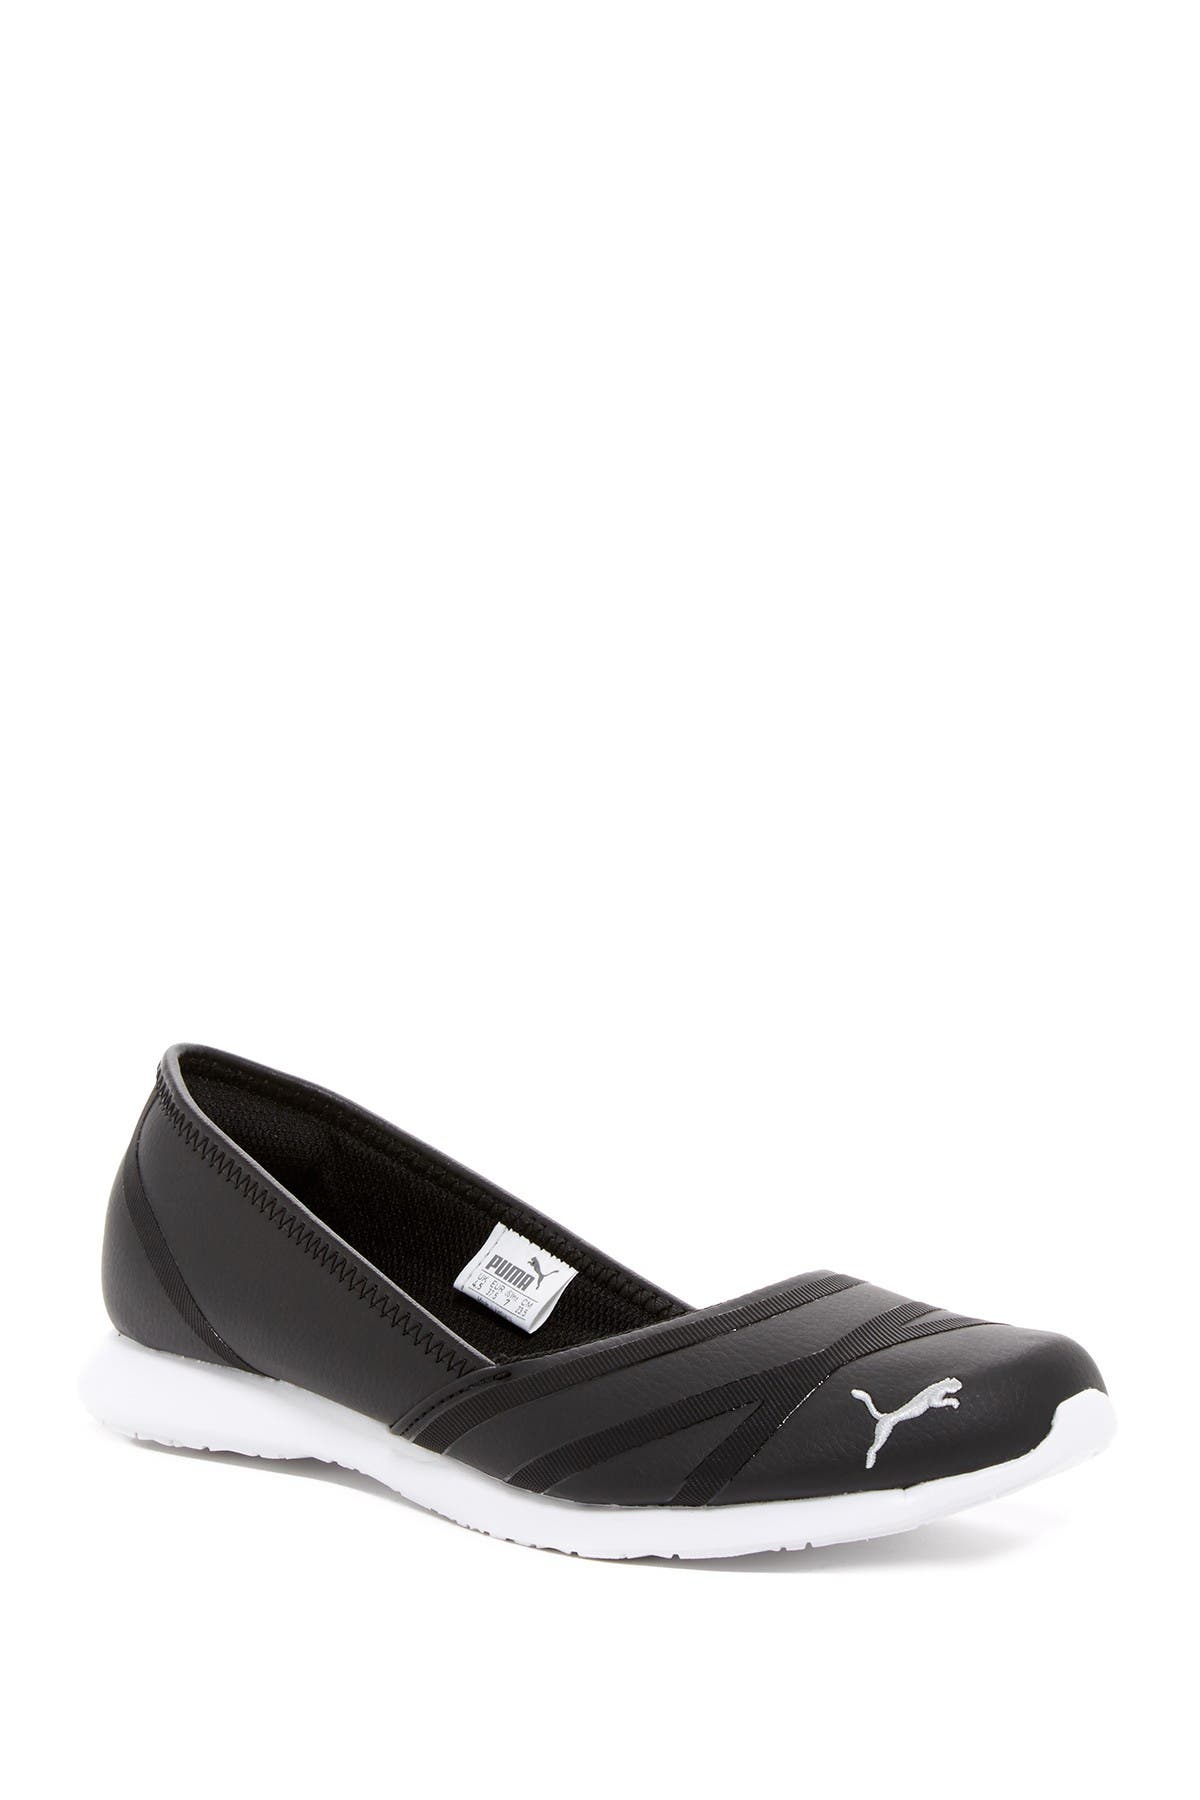 PUMA | Vega Ballet Sneaker Flat